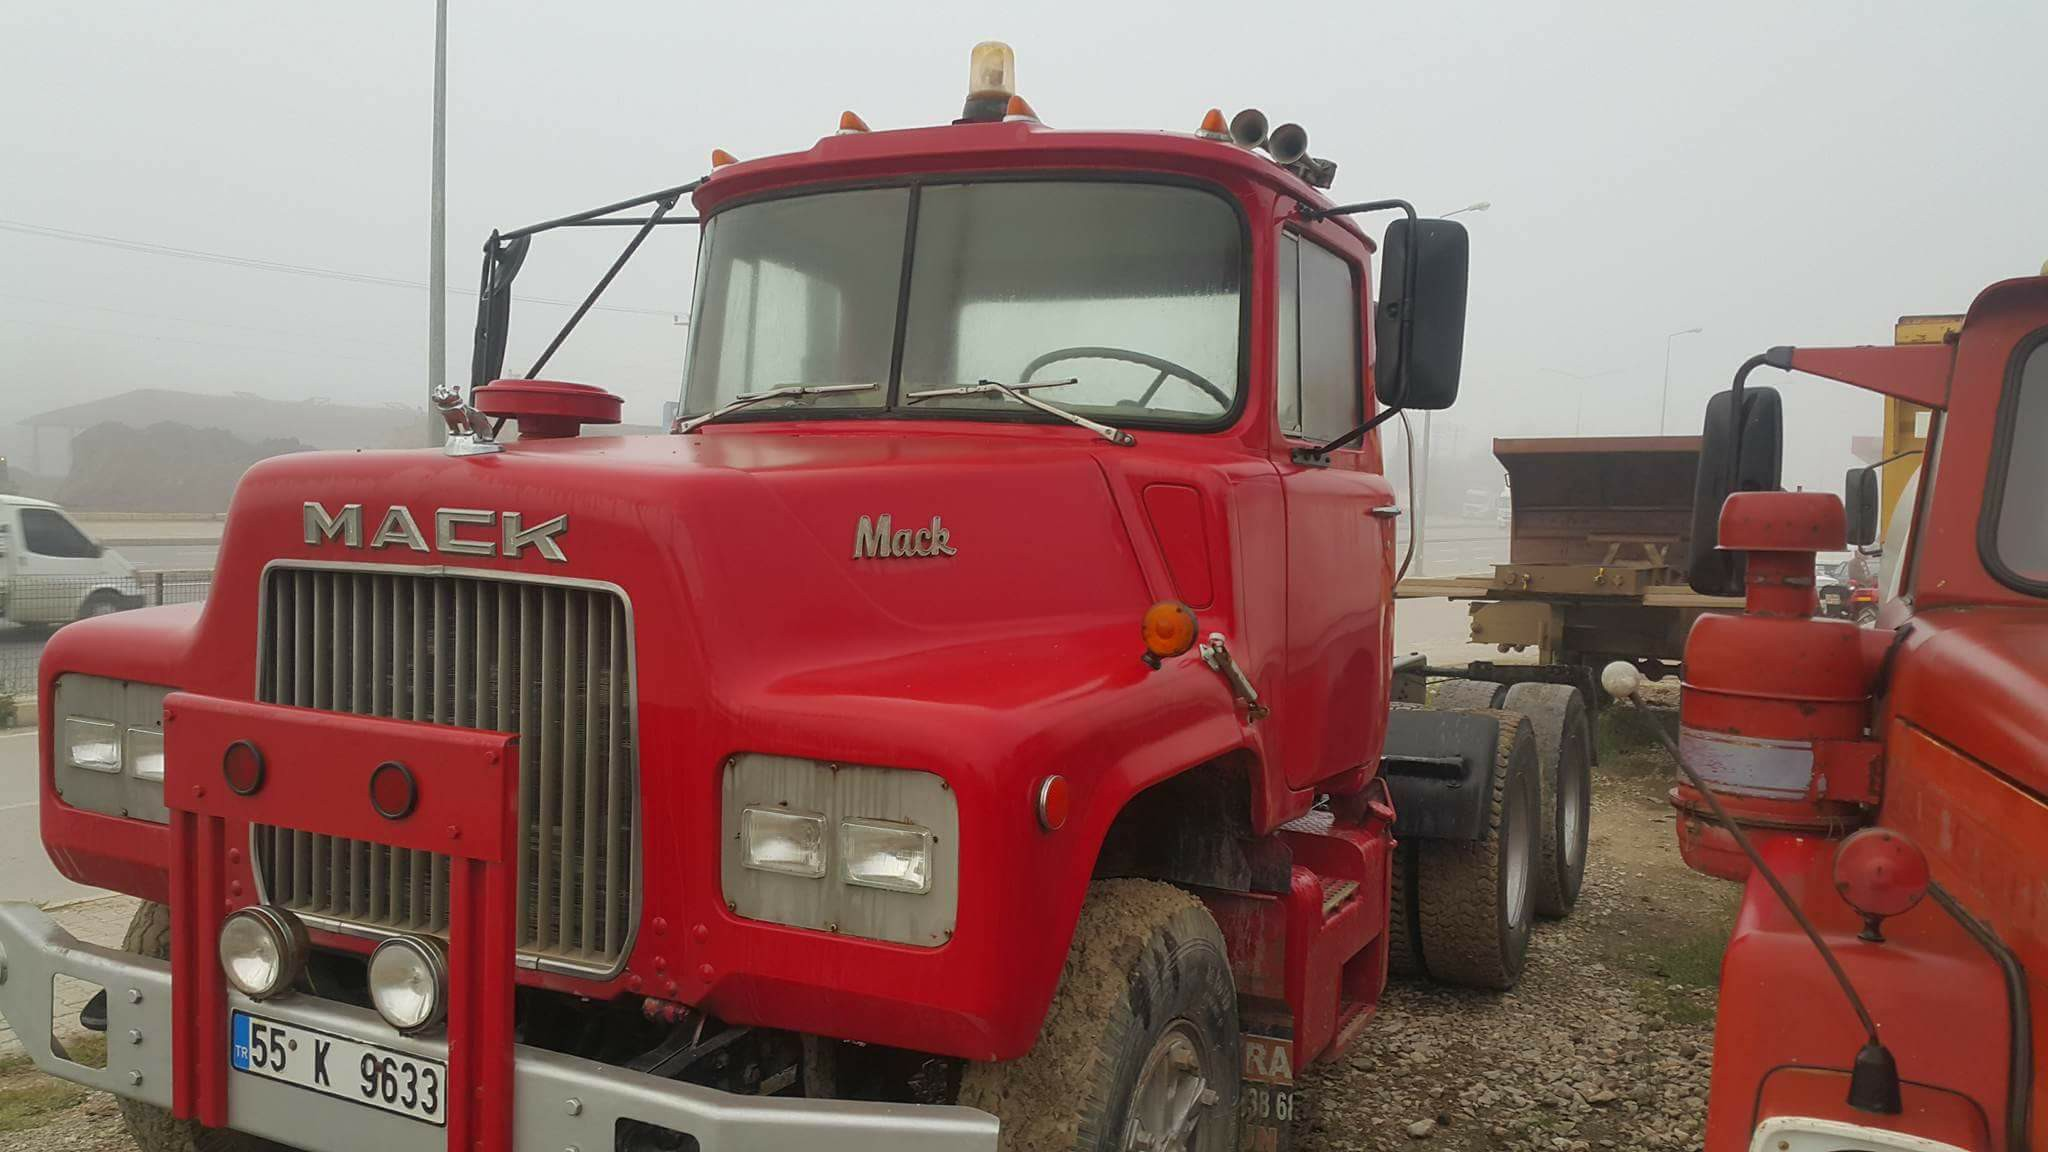 Mack-4X4-1